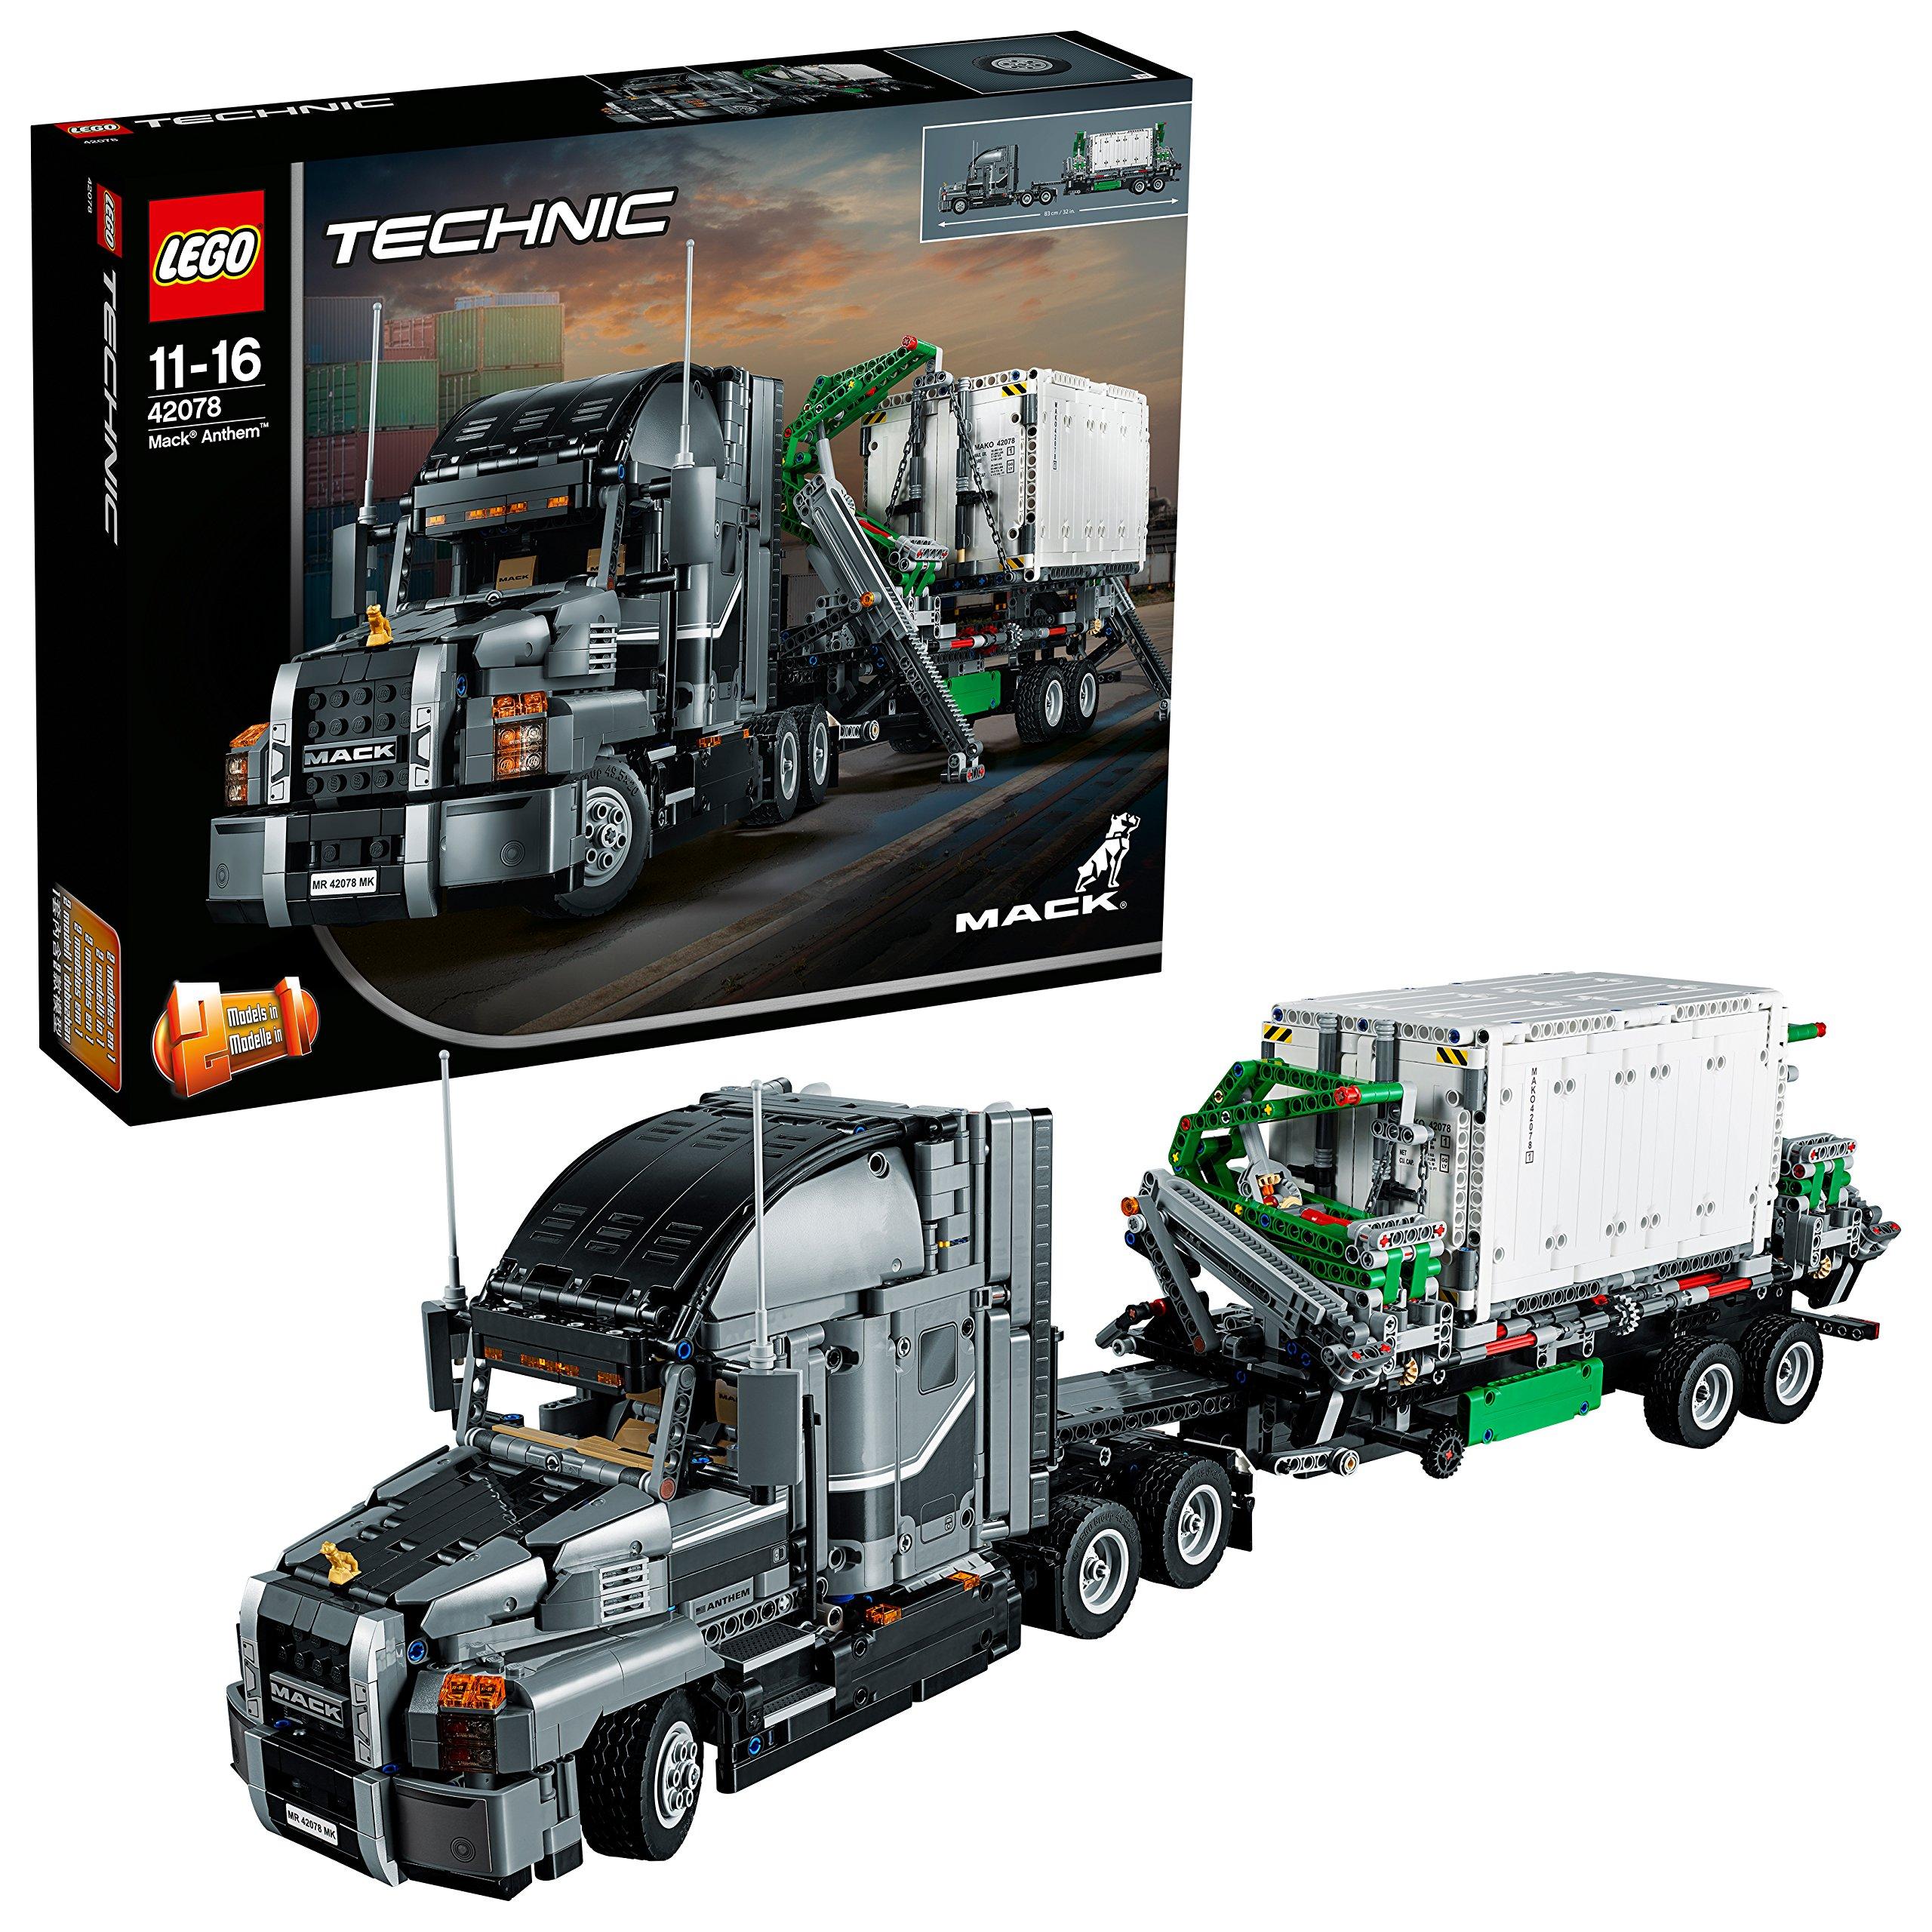 LEGO Technic – Mack Anthem (42078) Konstruktionsspielzeug